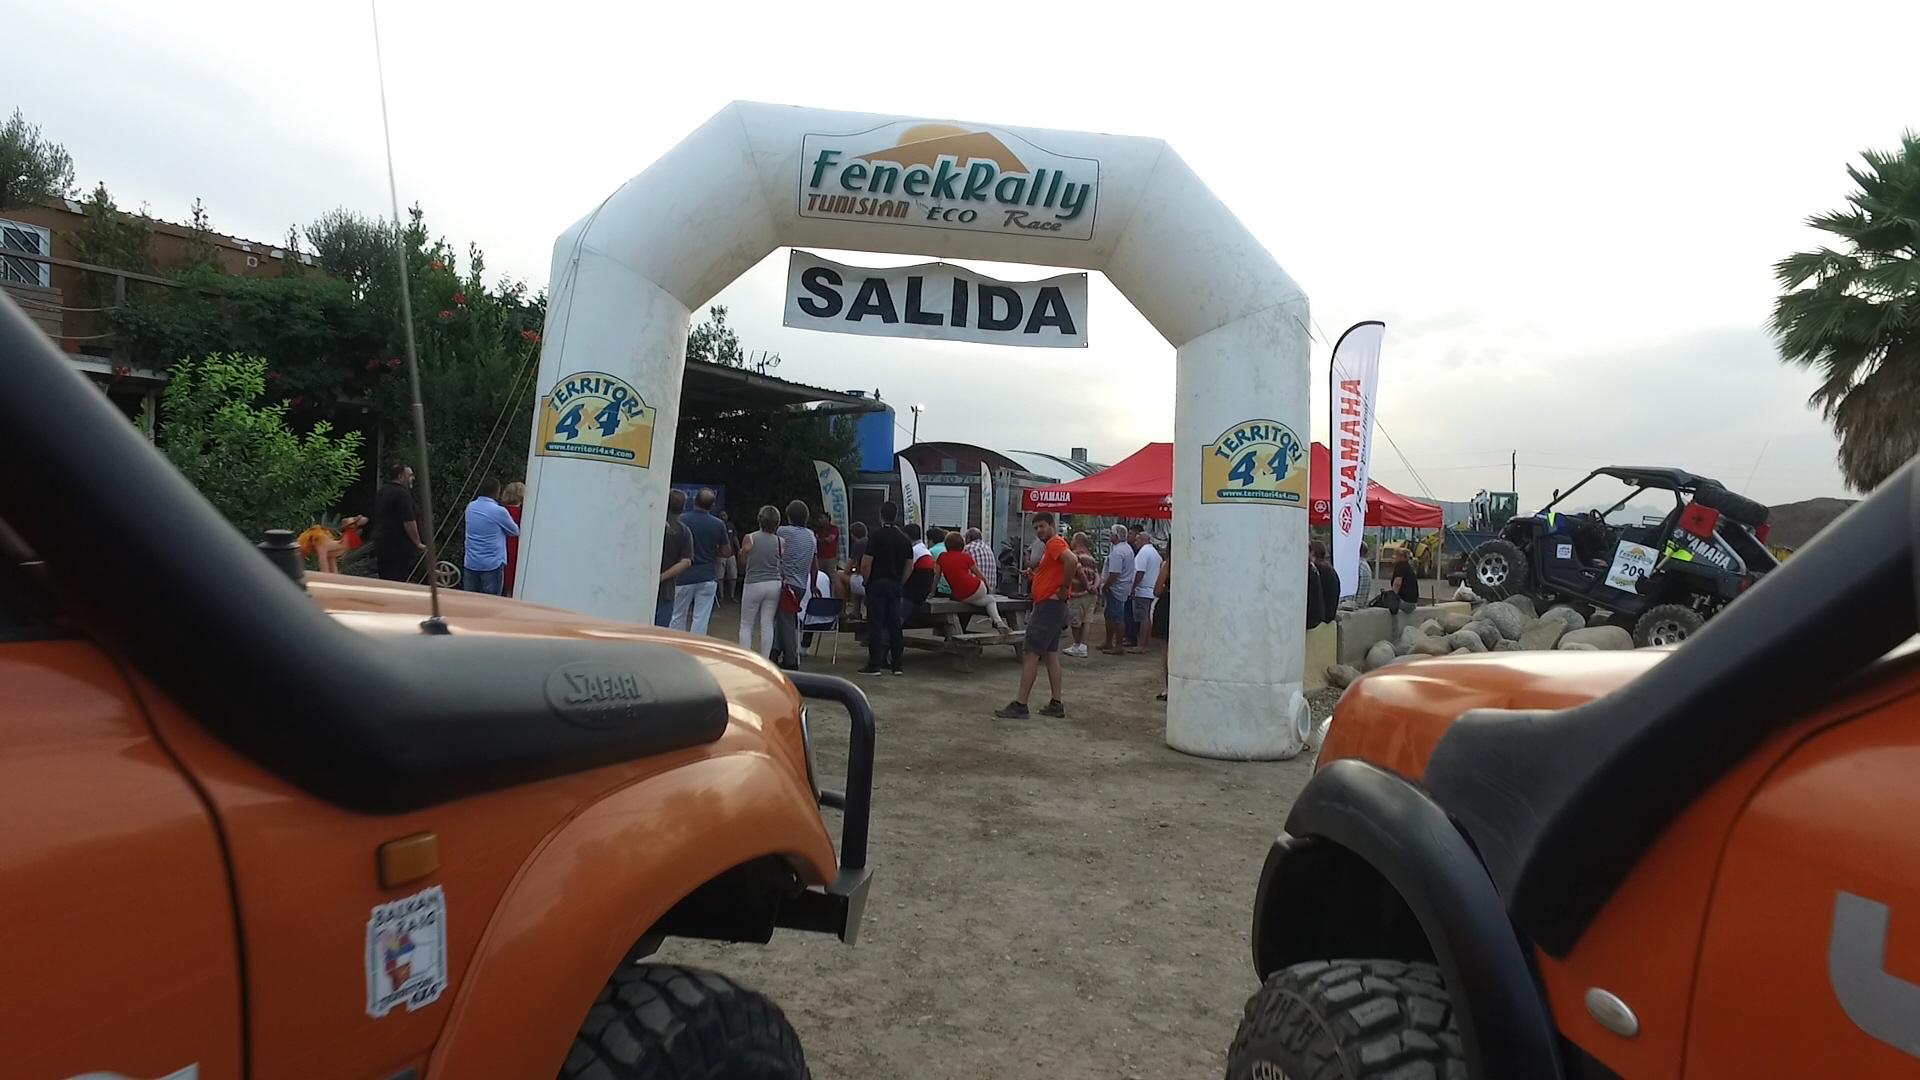 rally raid Marruecos Túnez 4x4 Moto Quad Buggy SSV